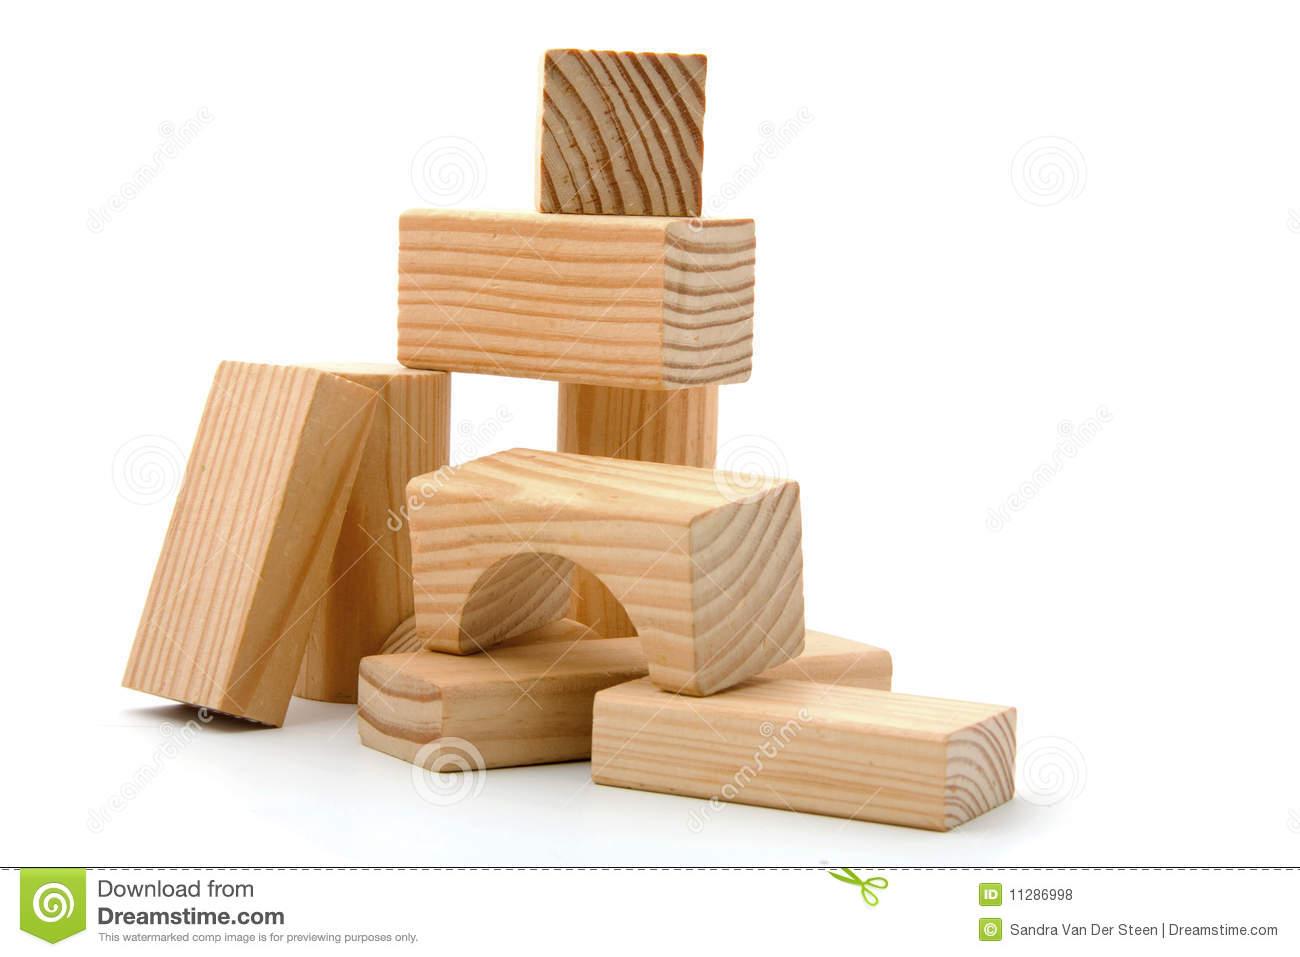 Clipart wood blocks.